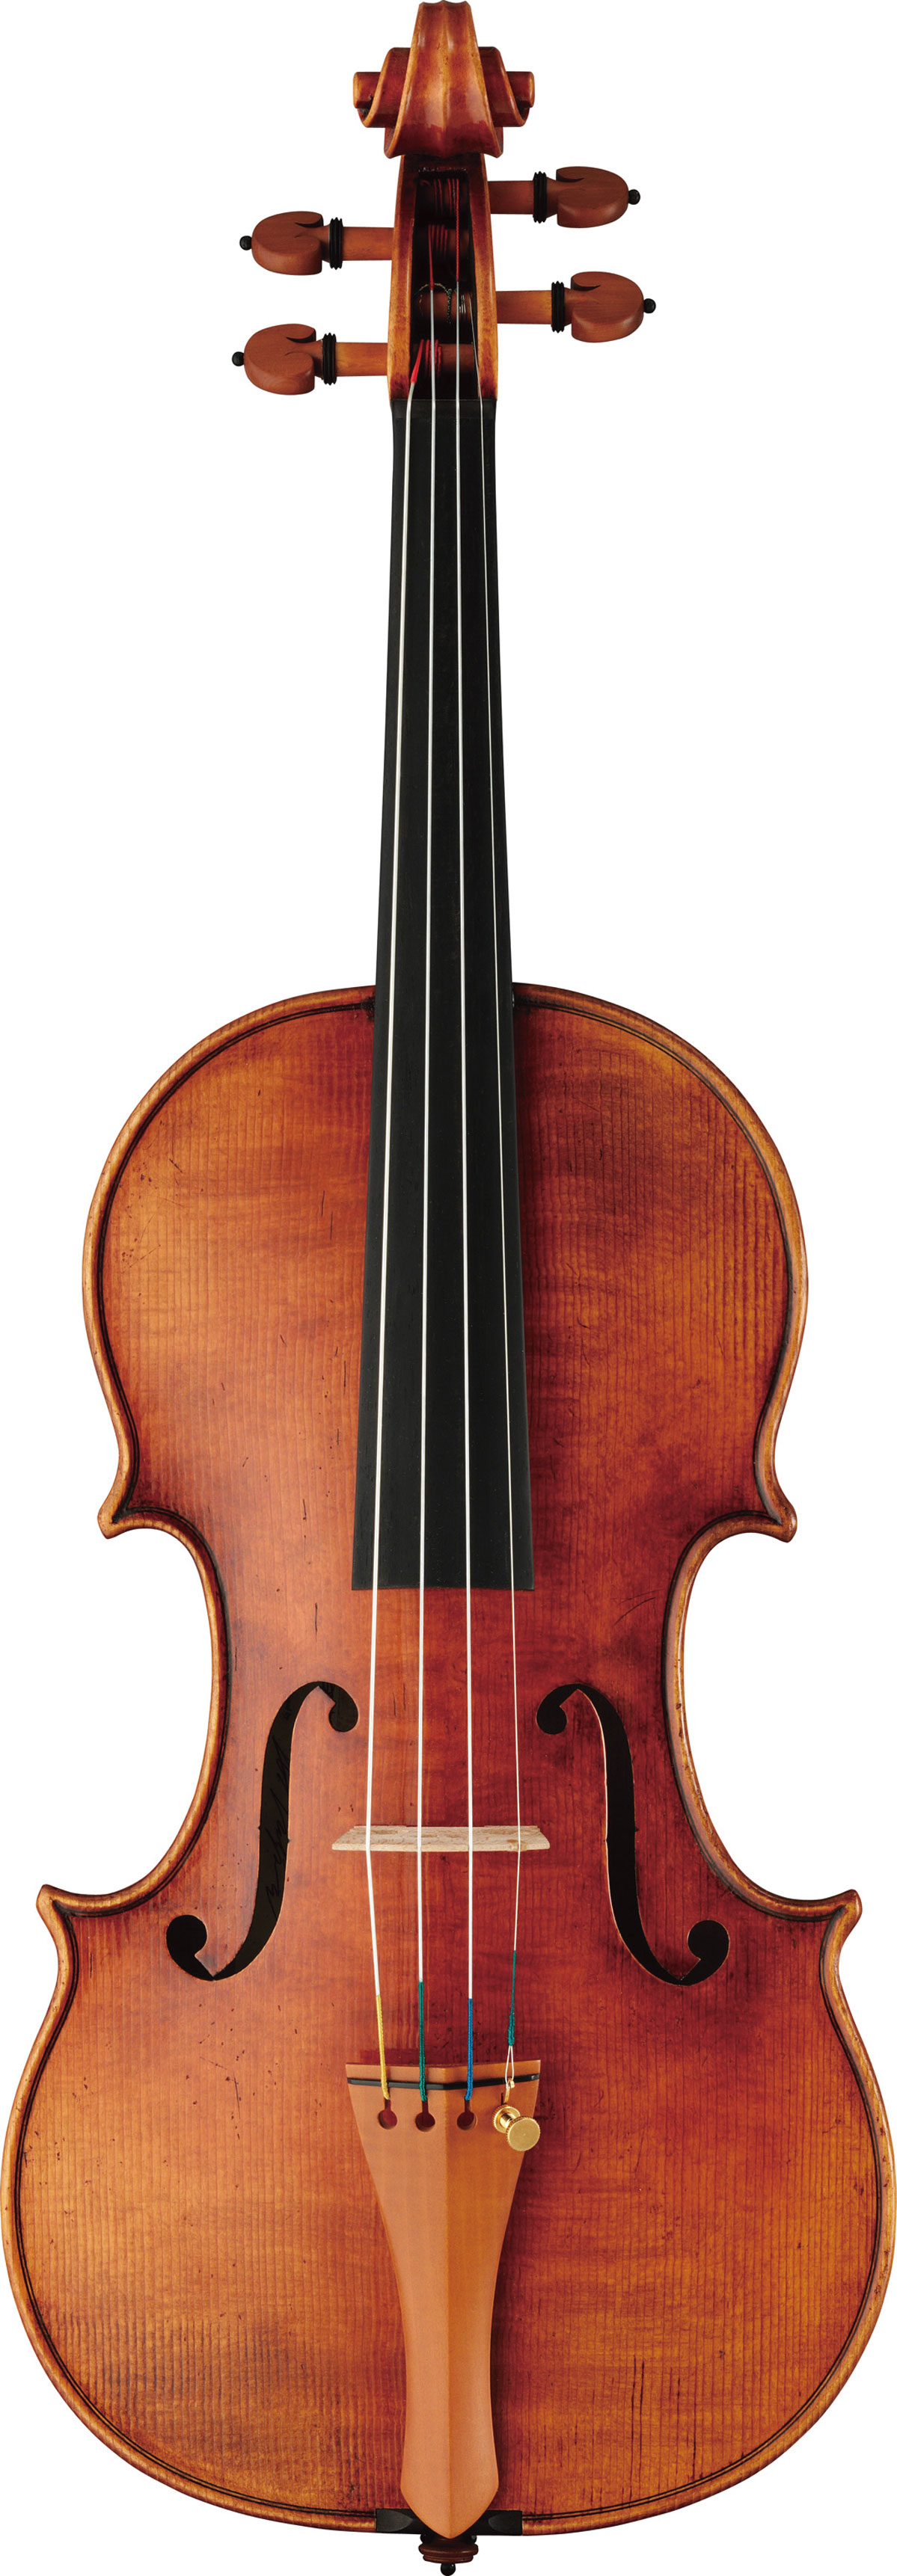 Yamaha yvn500s full size 4 4 stradivari style violin for Violin yamaha 4 4